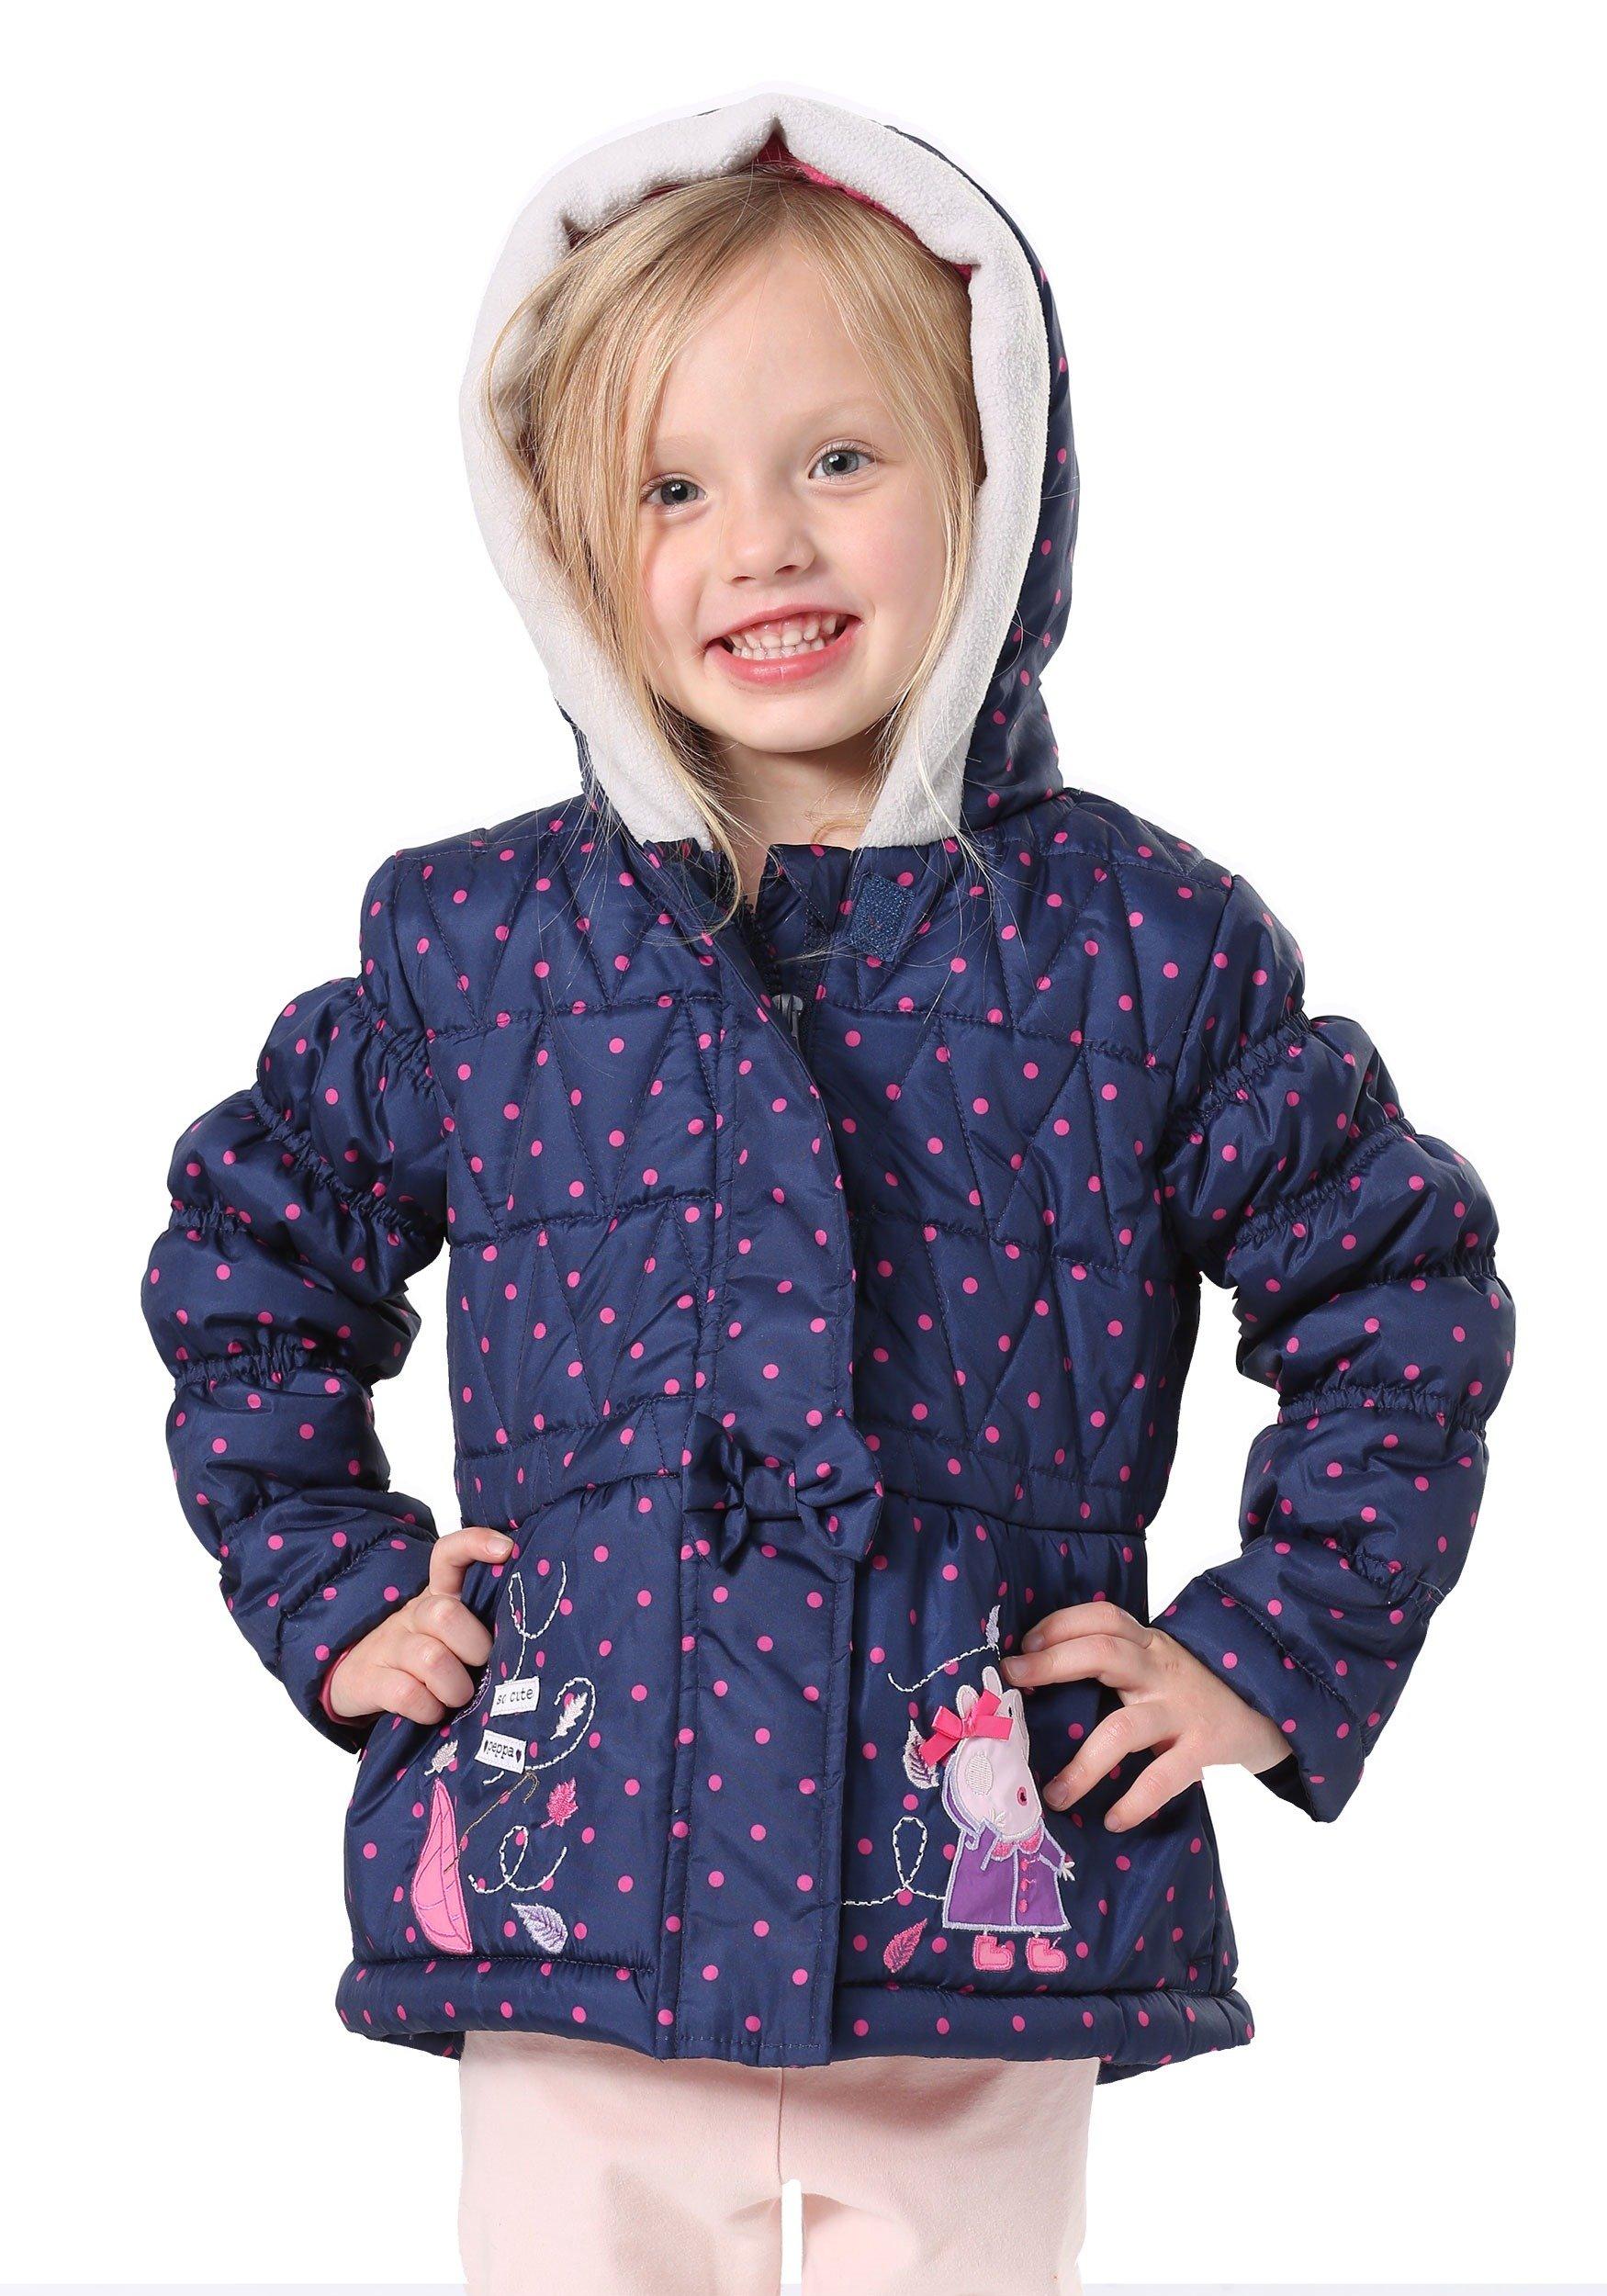 Peppa Pig Toddler Girls' Printed Polka Dot Puffer Coat, Blue, 2T